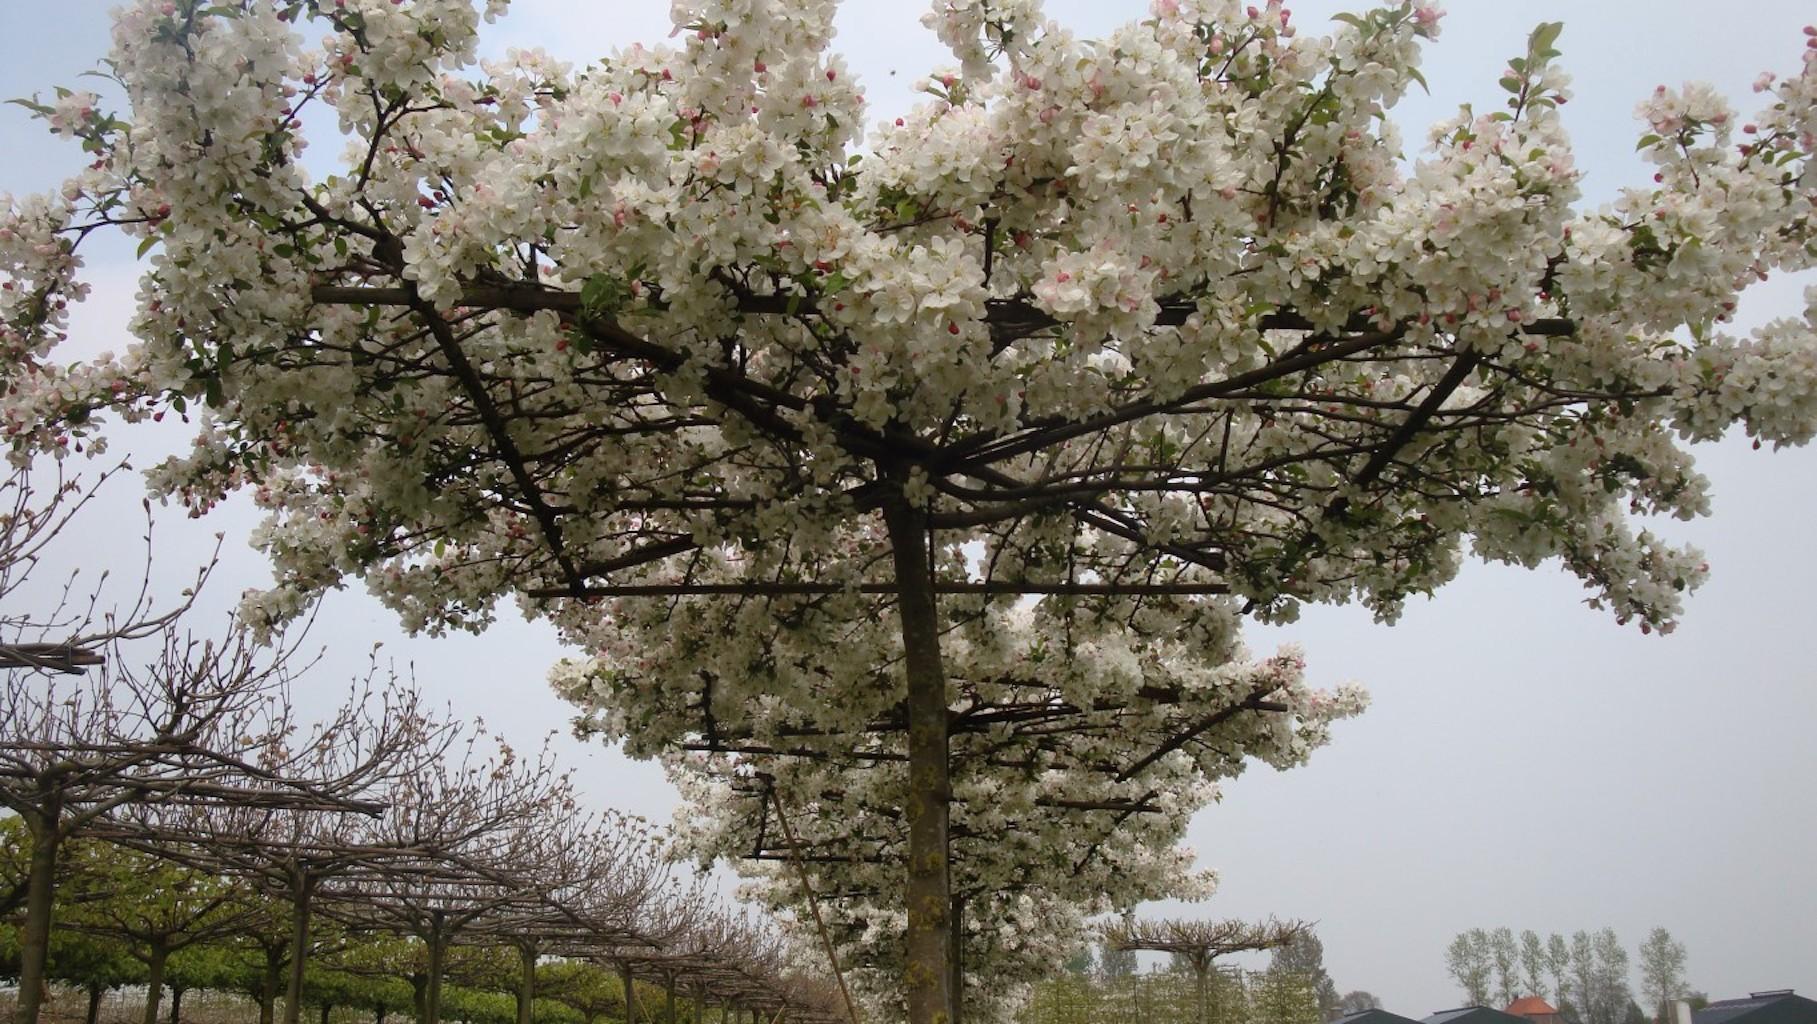 Malus 'Evereste' roof form in flower 20-25 (2)